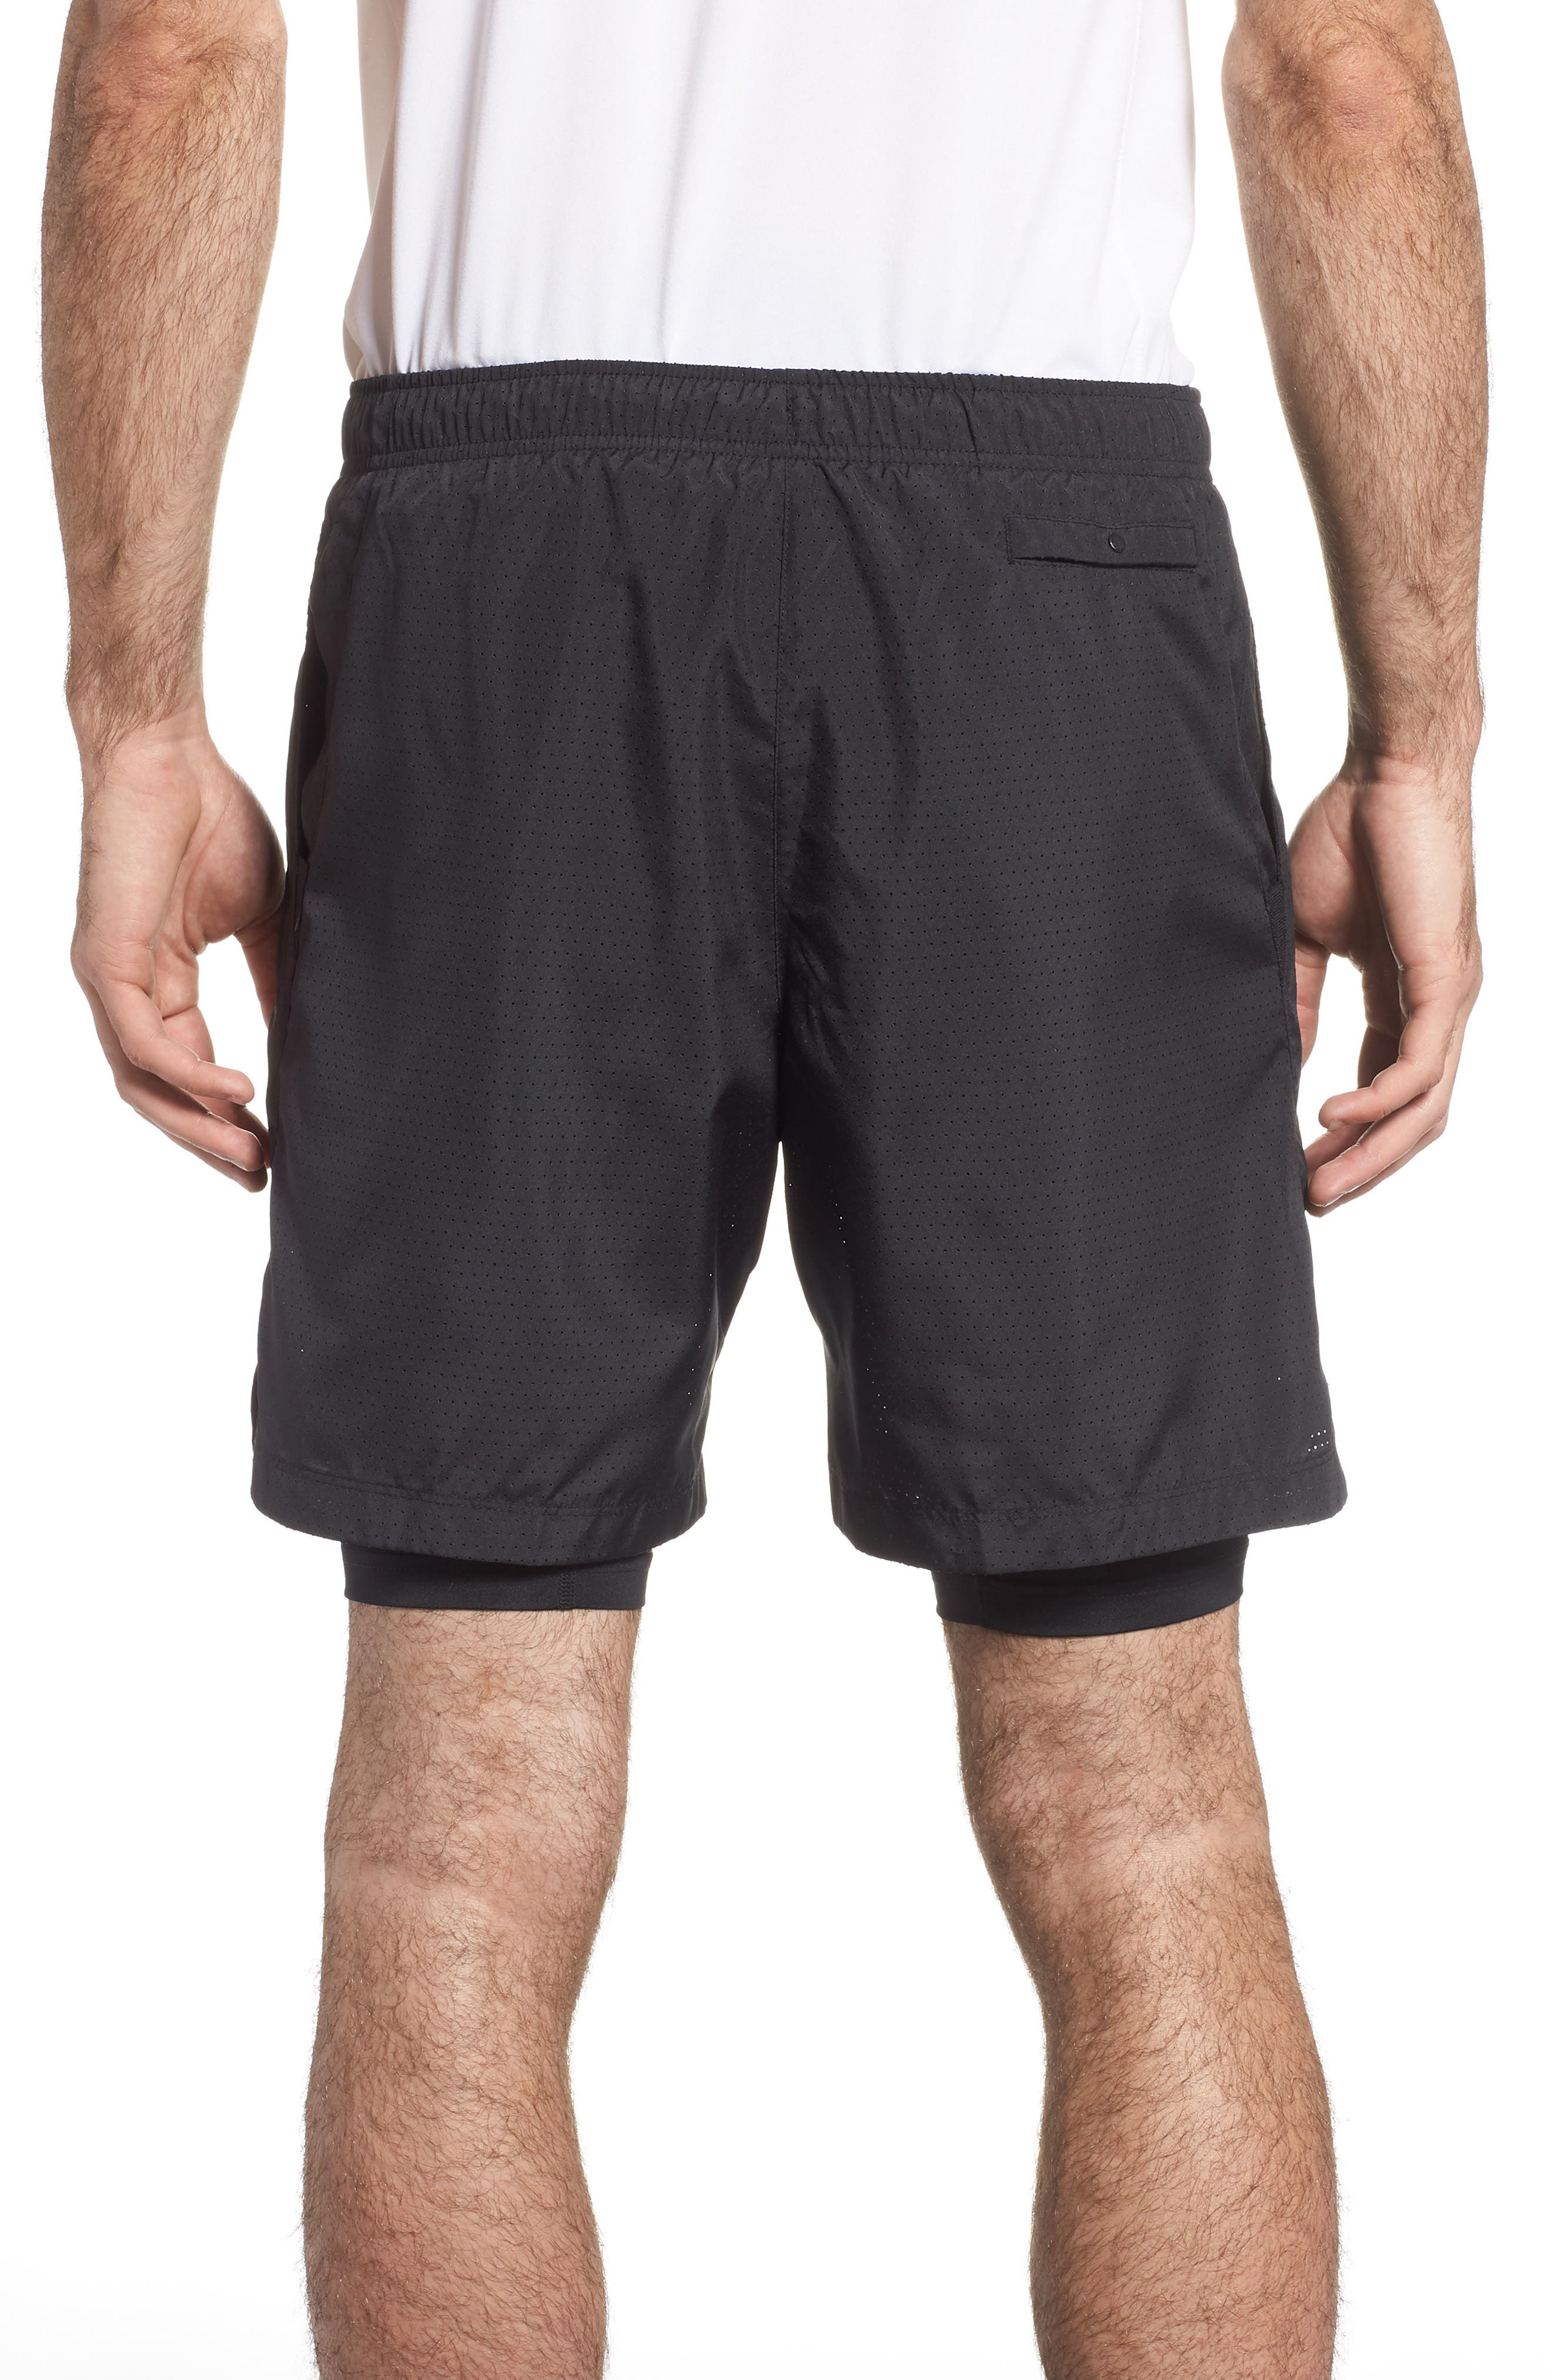 Running Challenger 2-in-1 Shorts,                             Alternate thumbnail 2, color,                             BLACK/ BLACK